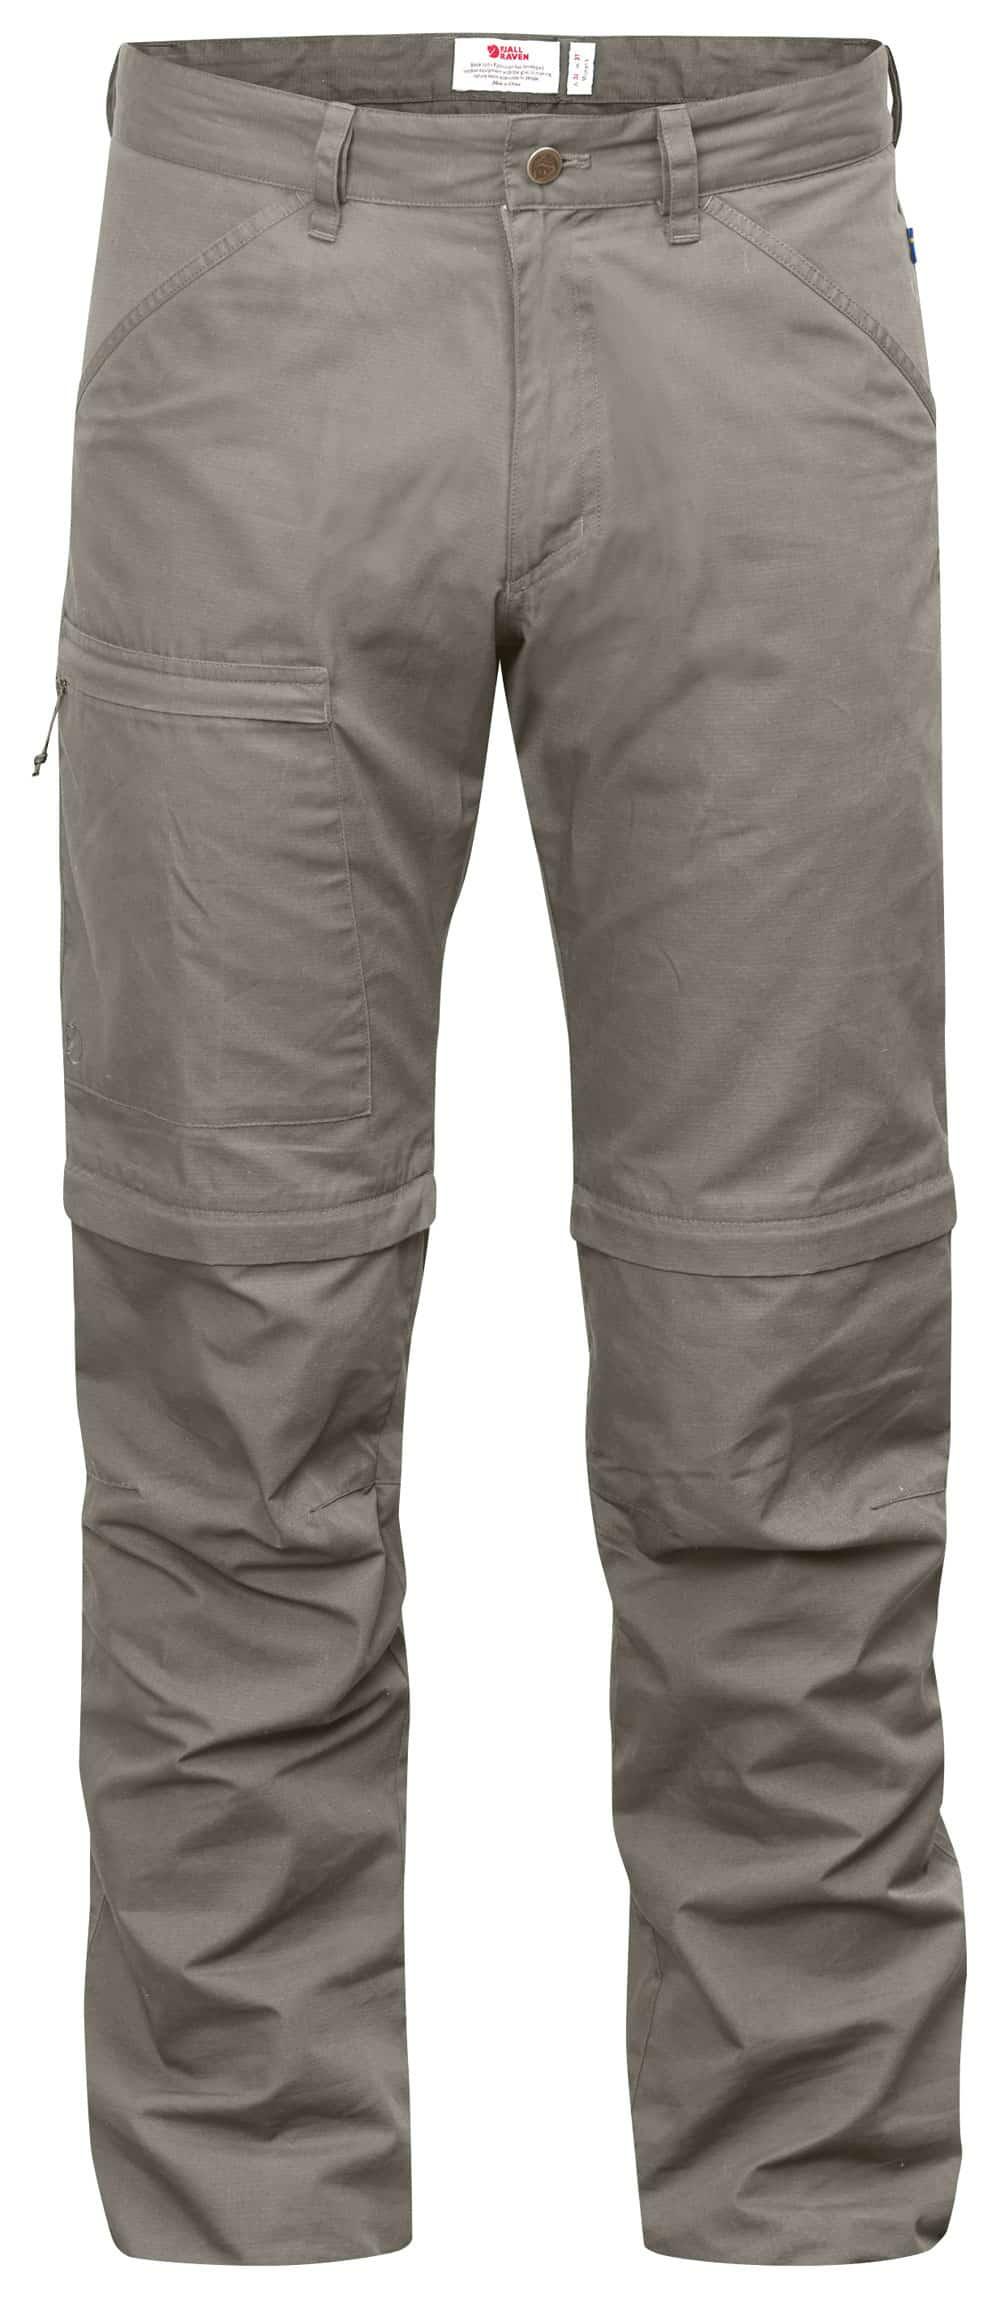 Fjällräven High Coast Zip Off Trousers | Opdag Verden